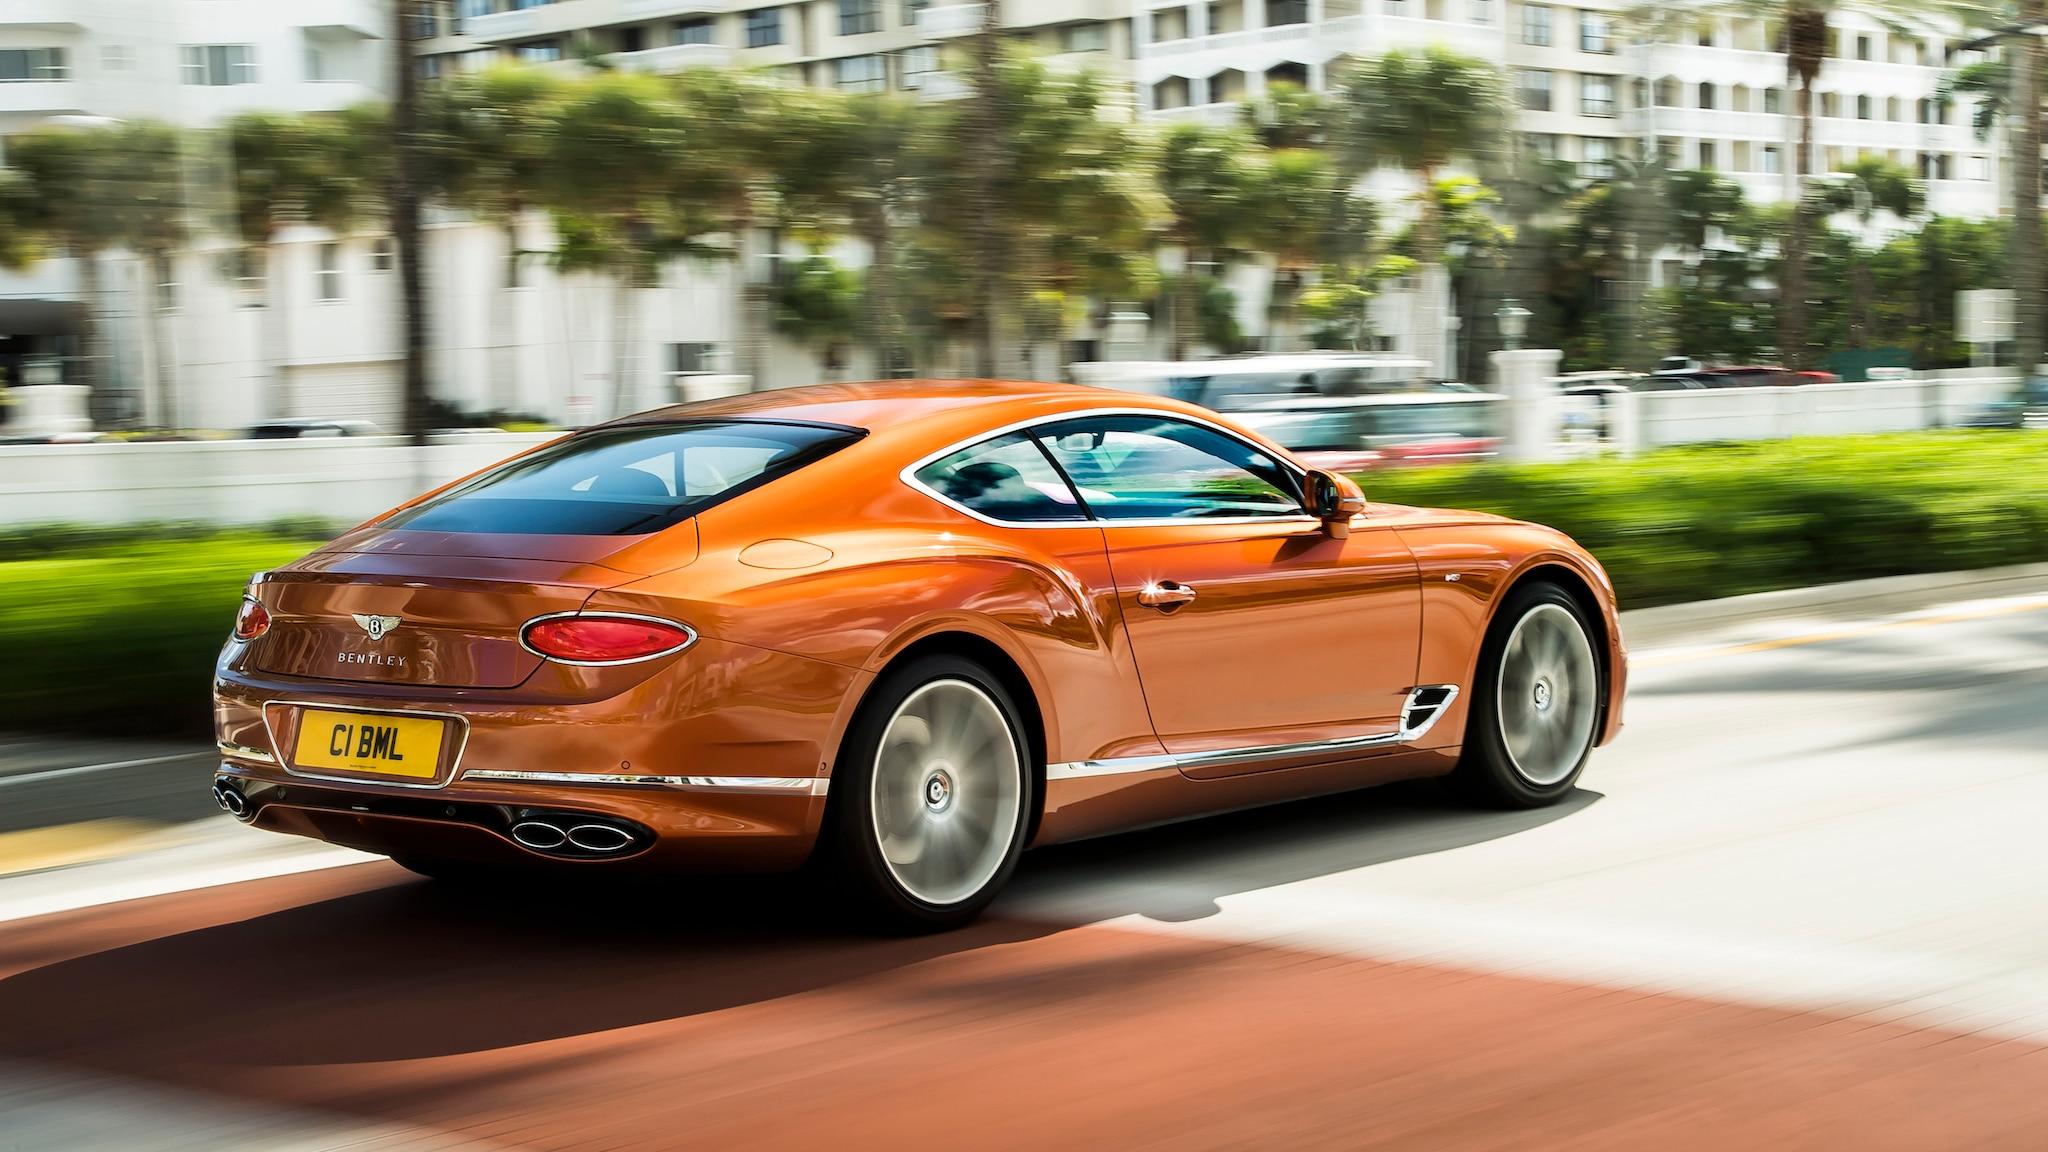 Bentley Continental GT V8 9 1